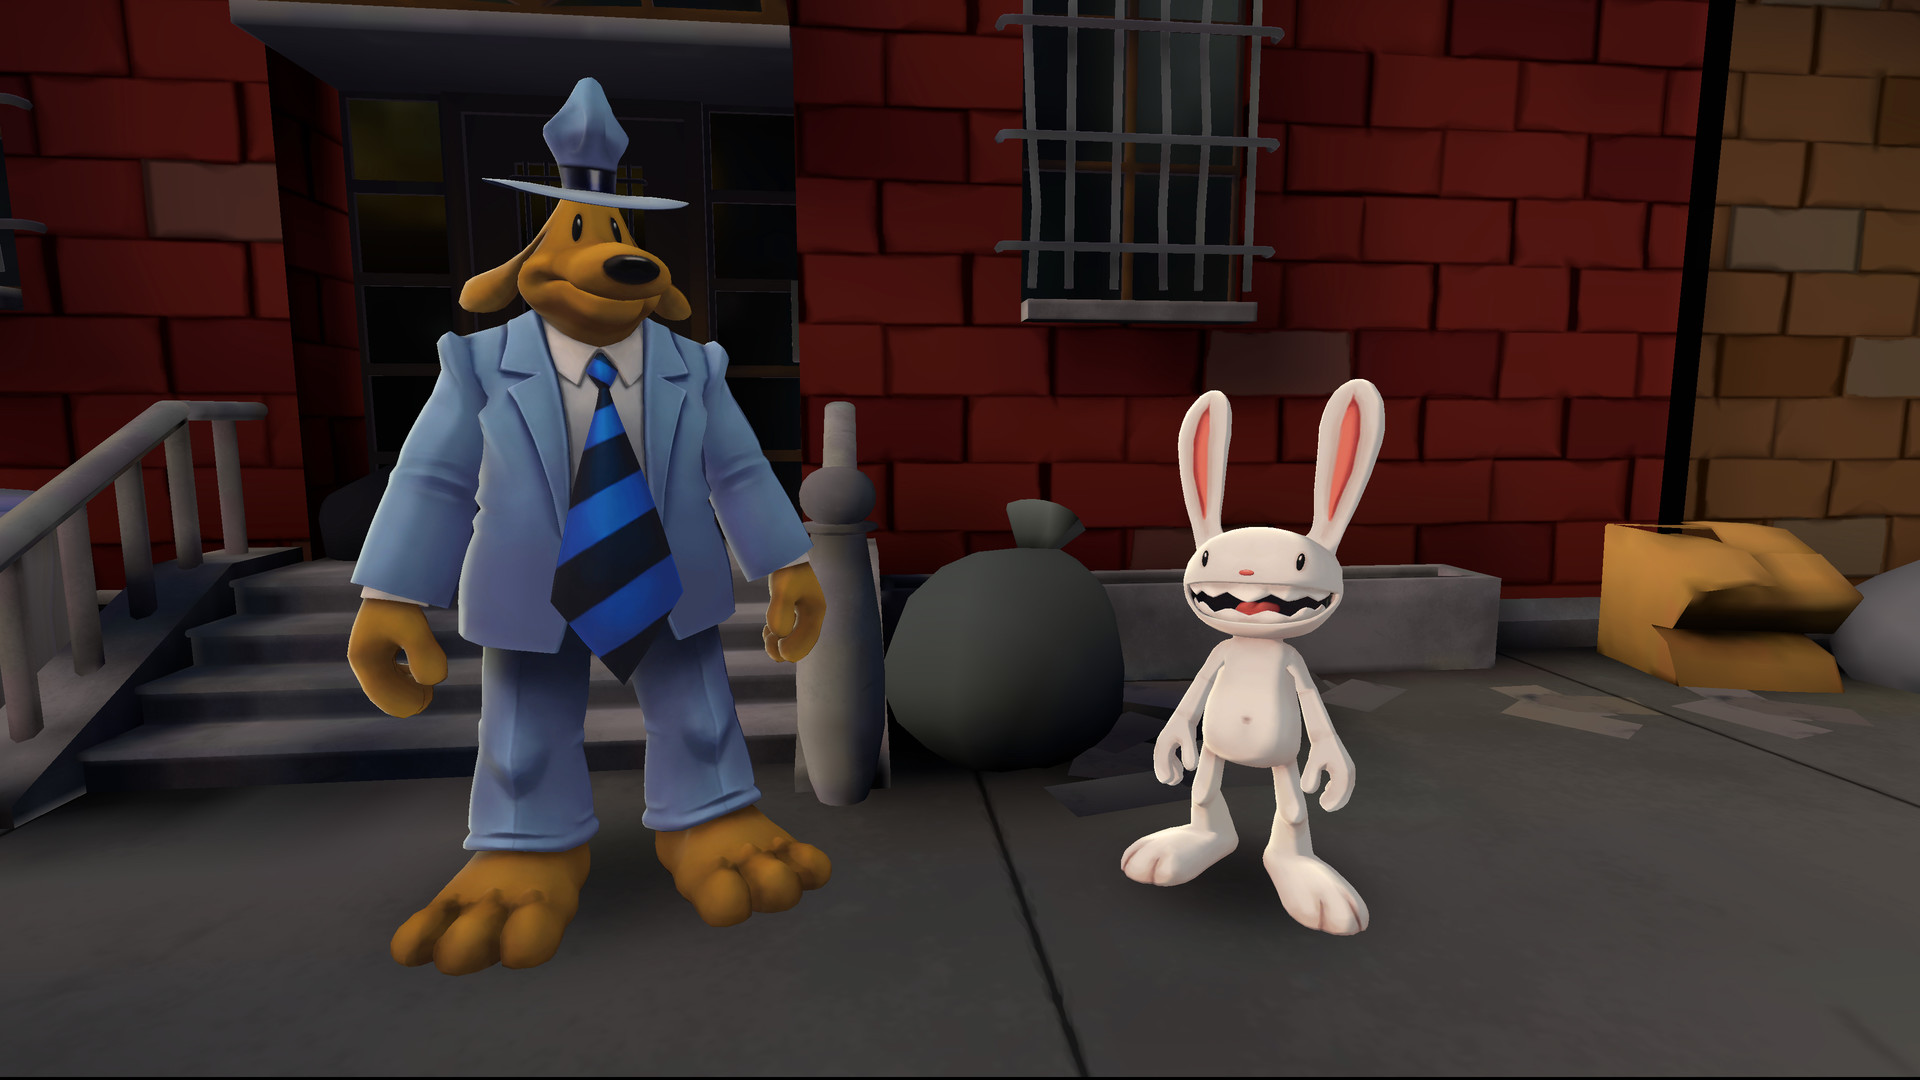 Sam & Max: This Time It's Virtual im Juli für Quest